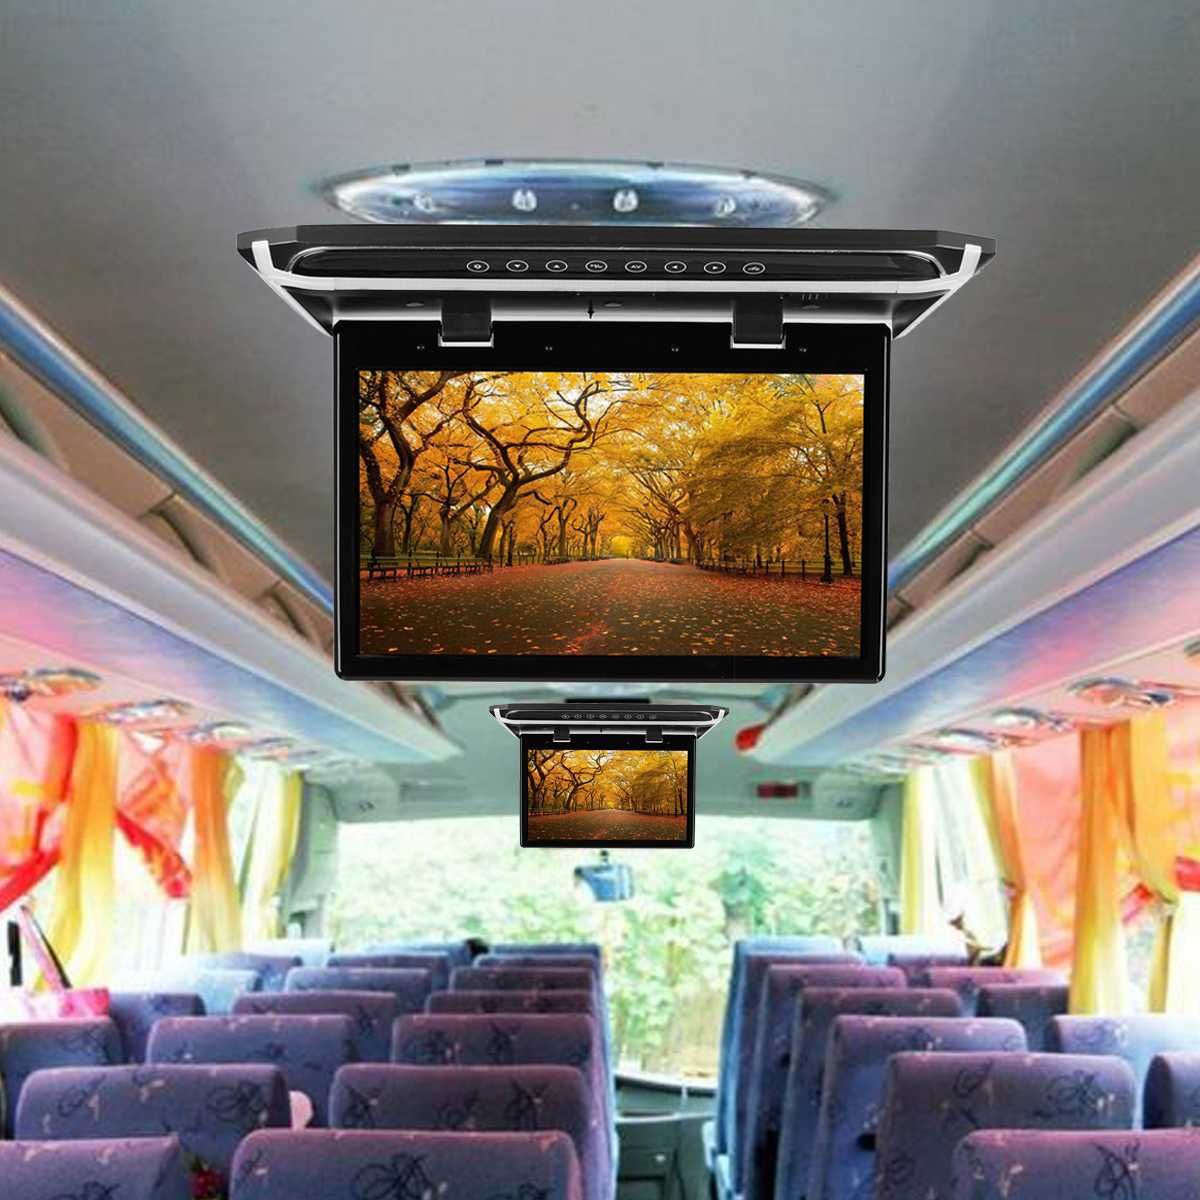 15.6 hd tela larga carro dvd player hdmi teto do carro flip down monitor telhado montagem jogador 1920*1080